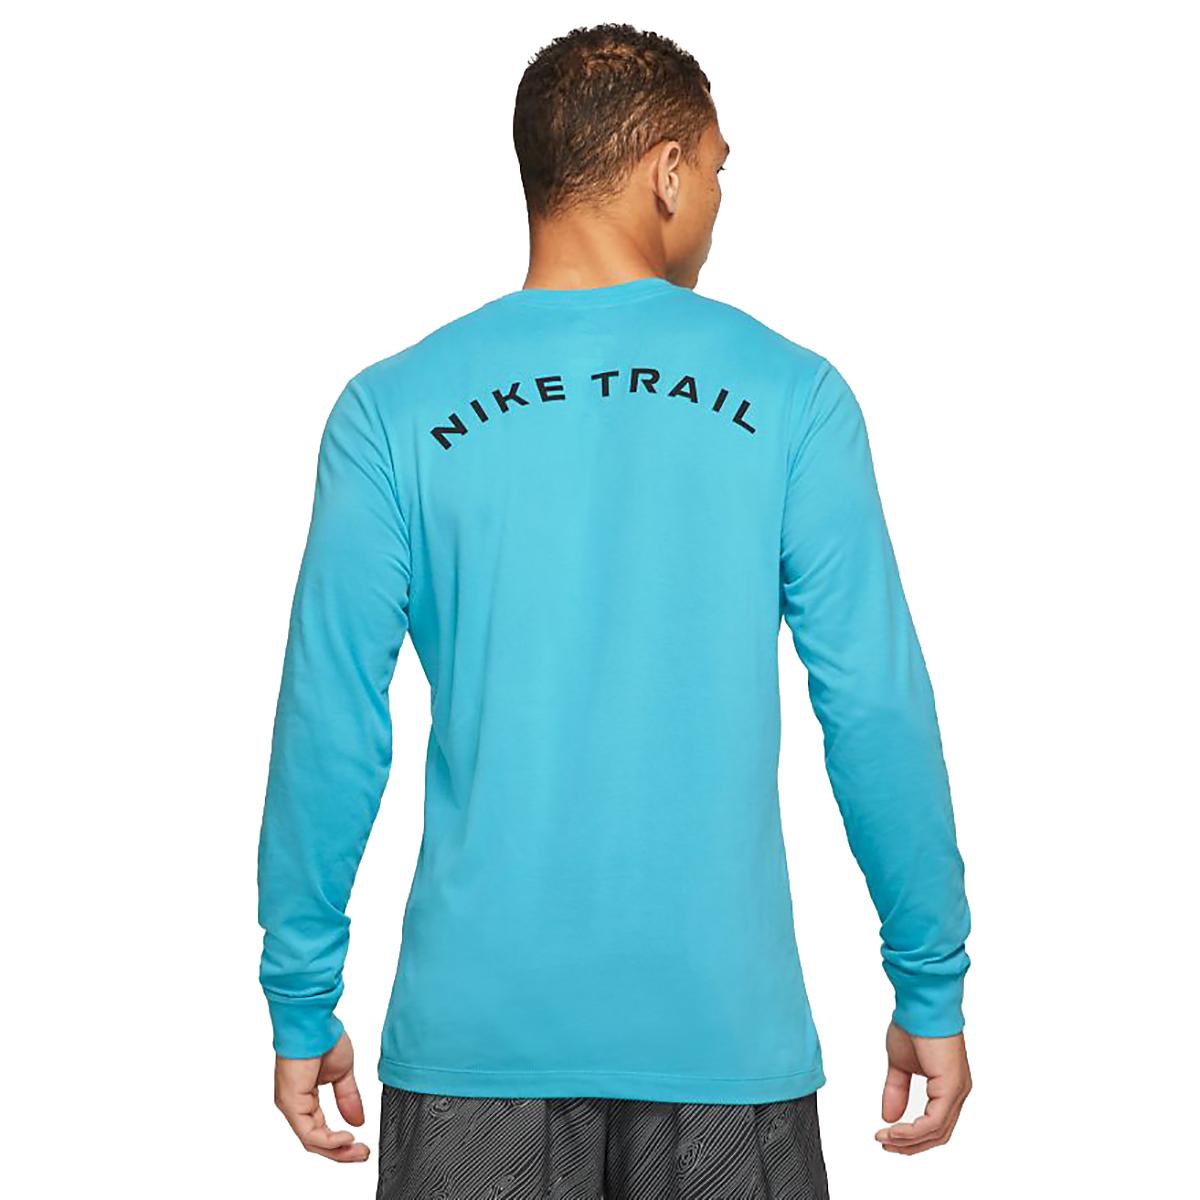 Men's Nike Dri-FIT Long-Sleeve Trail Running T-Shirt - Color: Chlorine Blue - Size: XS, Chlorine Blue, large, image 2